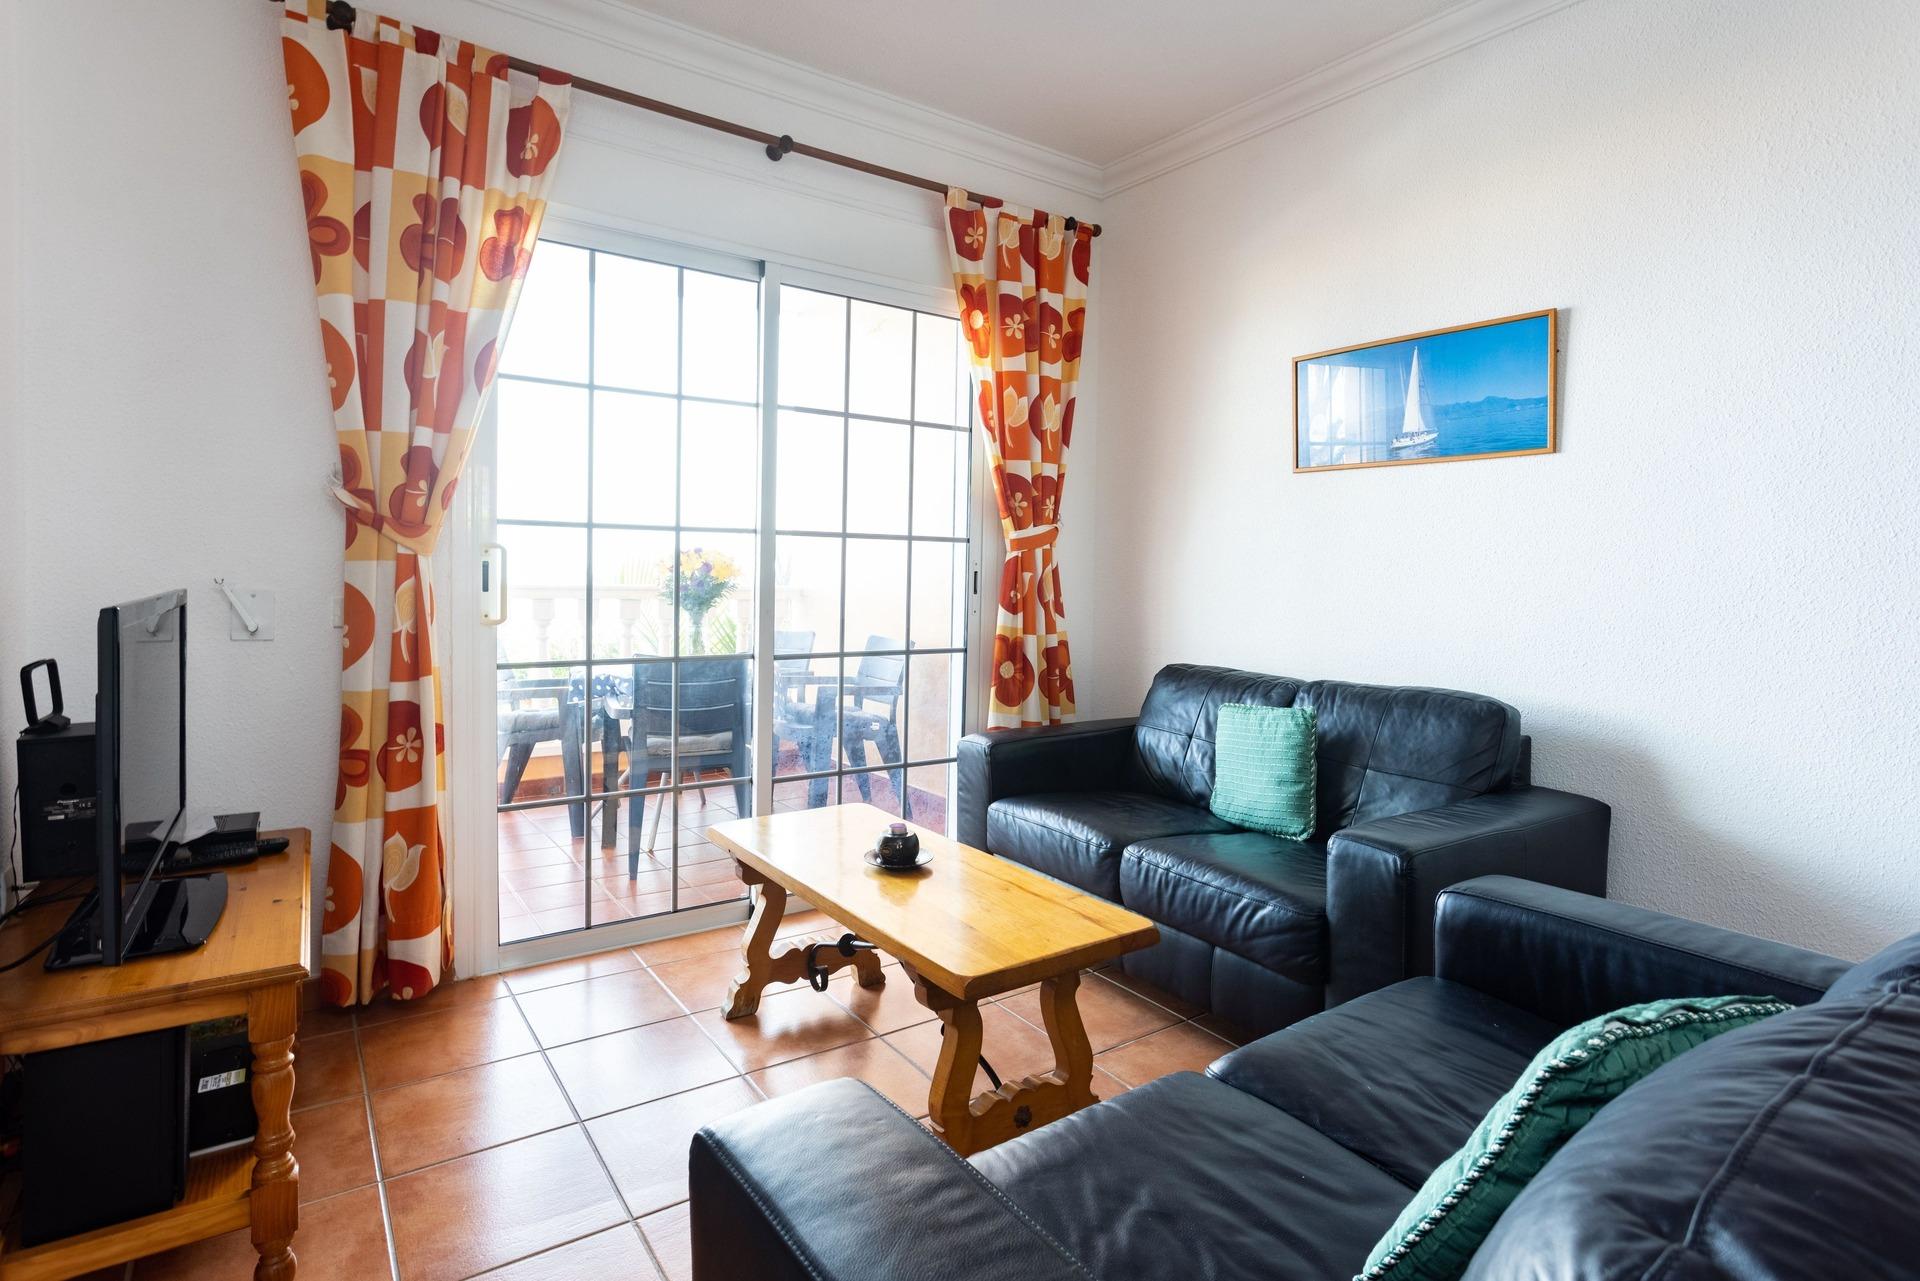 Appartement de vacances Fewo Playamar Romantico, Nähe Strand, toller Meerblick, 2 Schlafzimmer, 2 Terrassen, Pool, (2492988), Puerto de la Cruz, Ténérife, Iles Canaries, Espagne, image 2